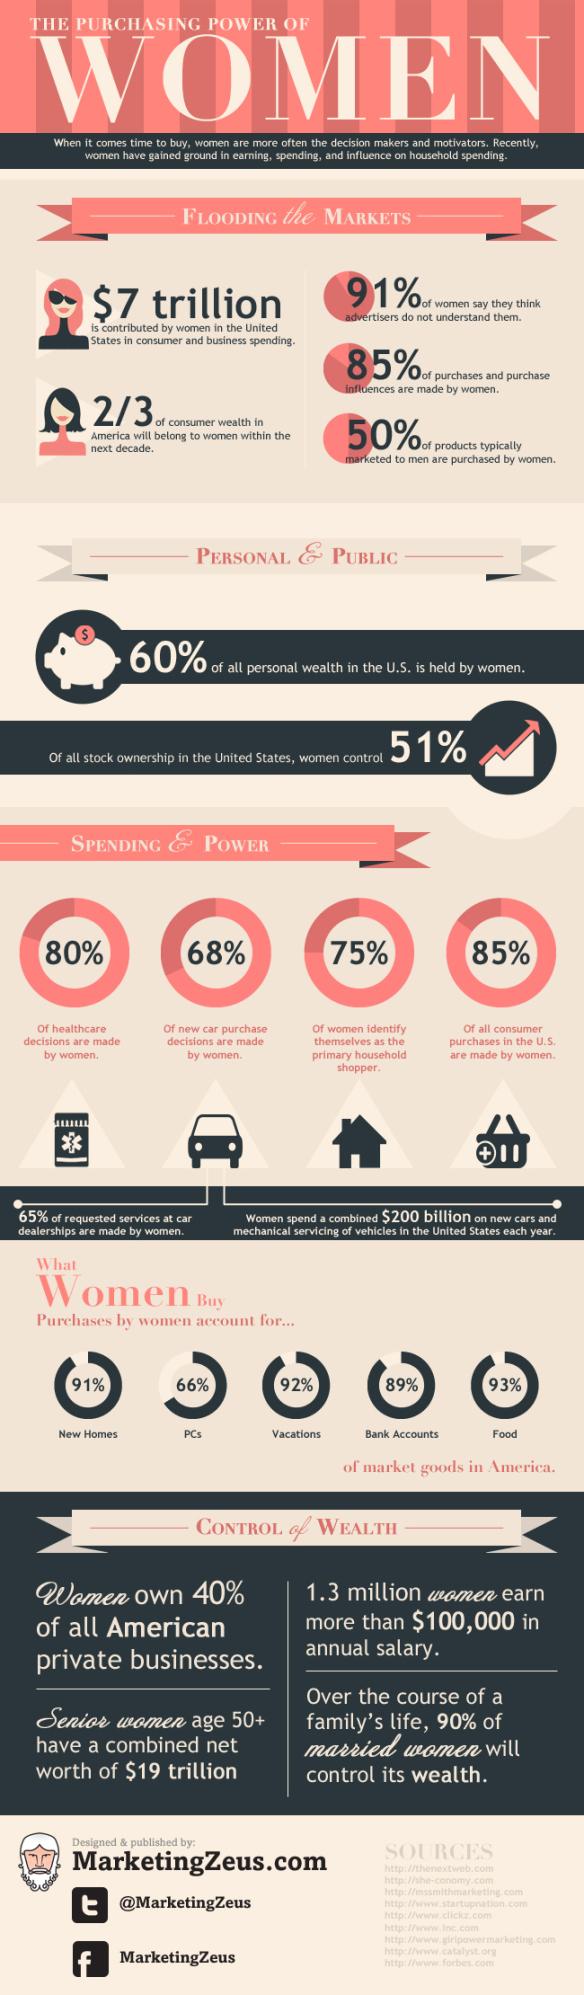 Women purchasing power infographic spending